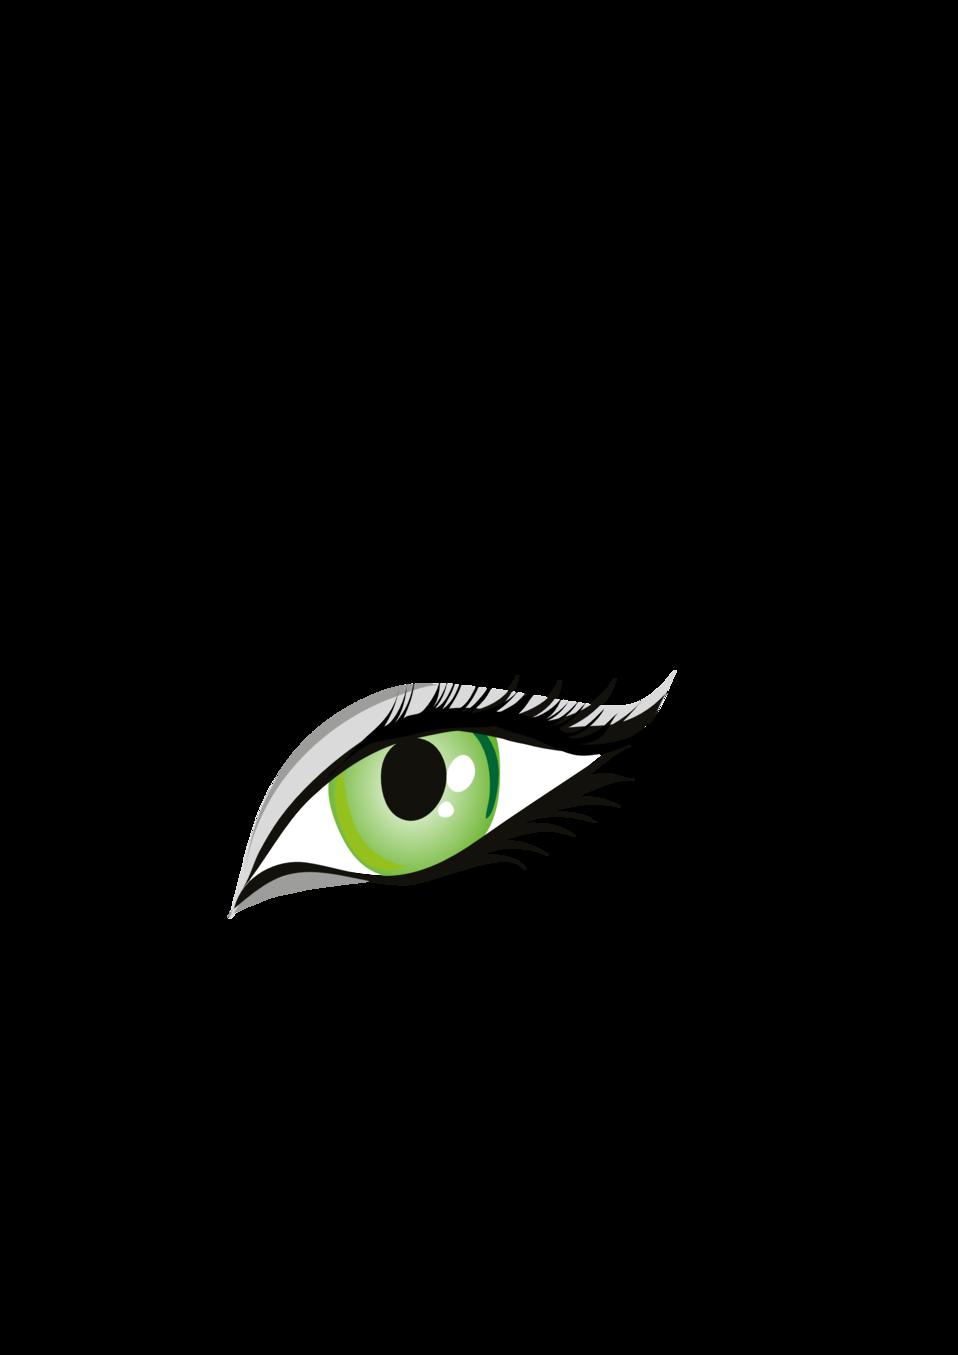 Public domain clip art. Eye clipart illustration